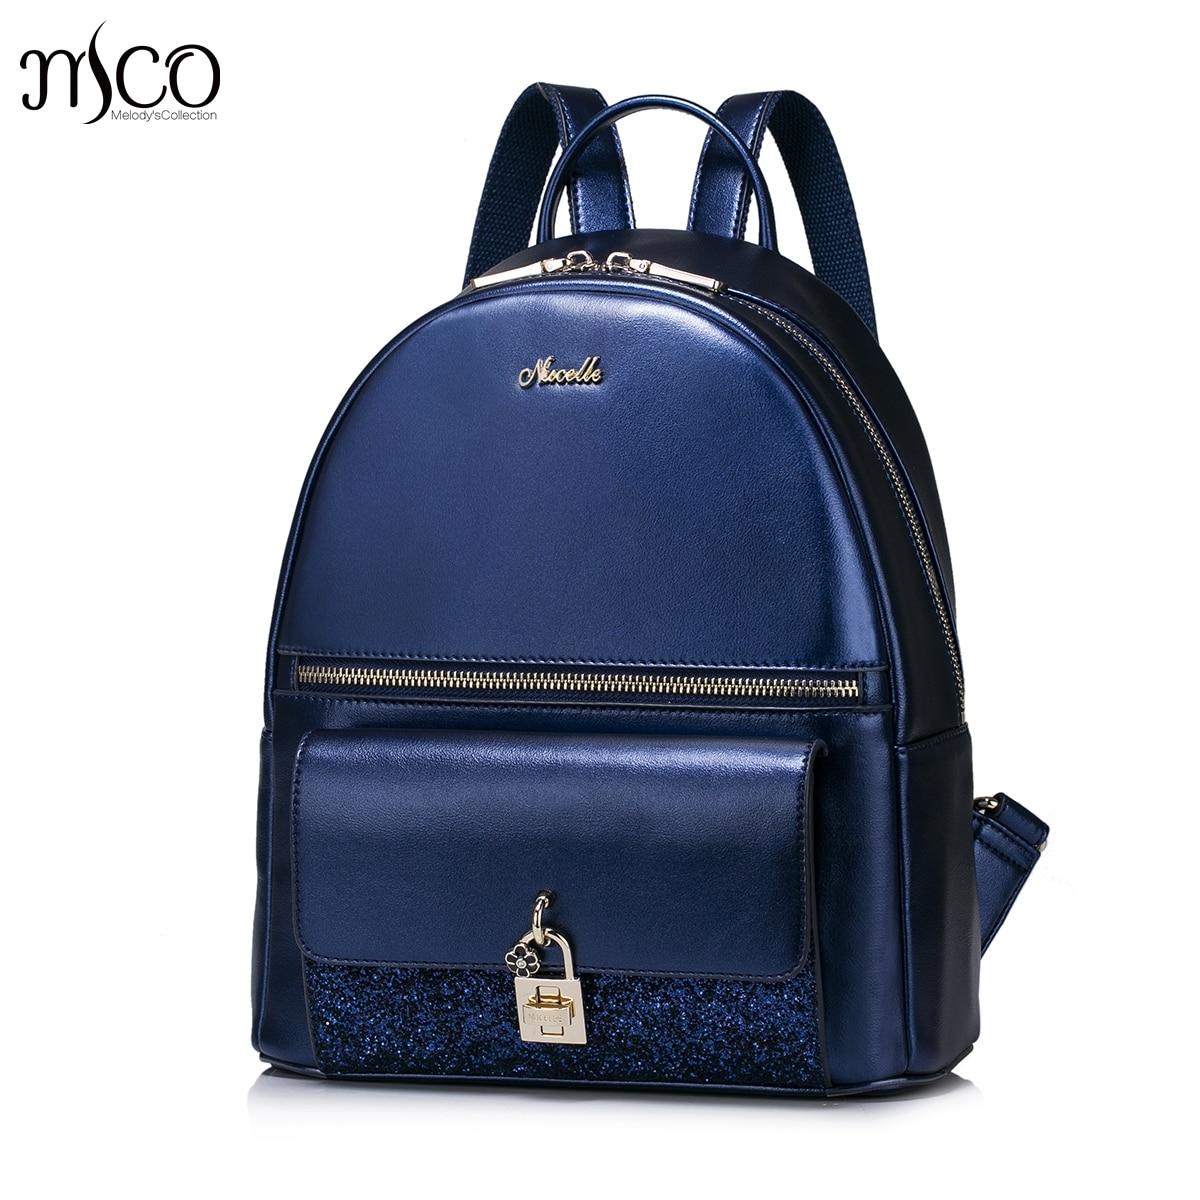 Women PU Leather Backpack Fashion Brief Female Elegant Daily Shoulder Bags Ladies Daypack Lock Vintage Travel Rucksack